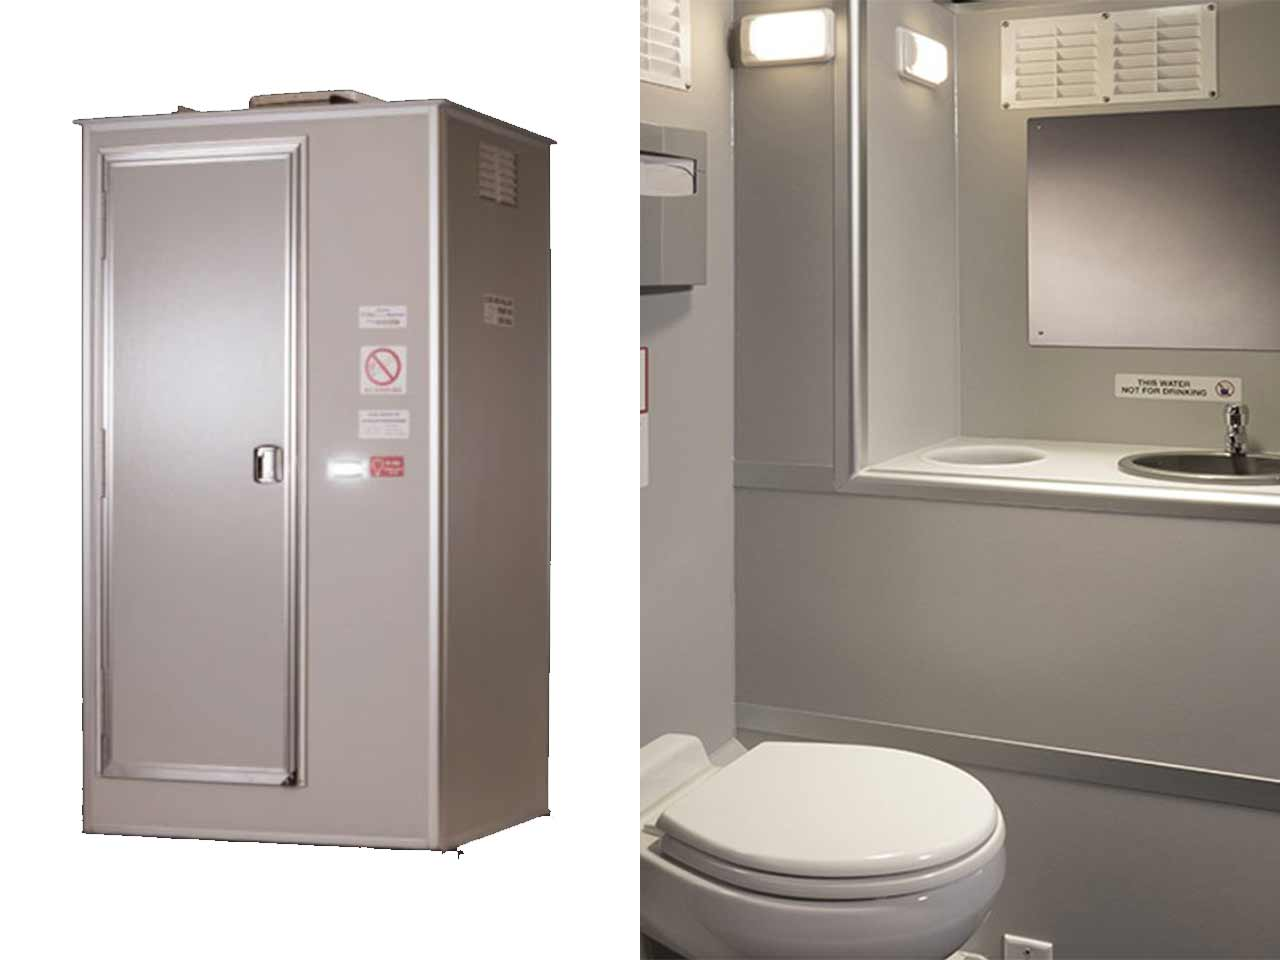 VIP portable restroom